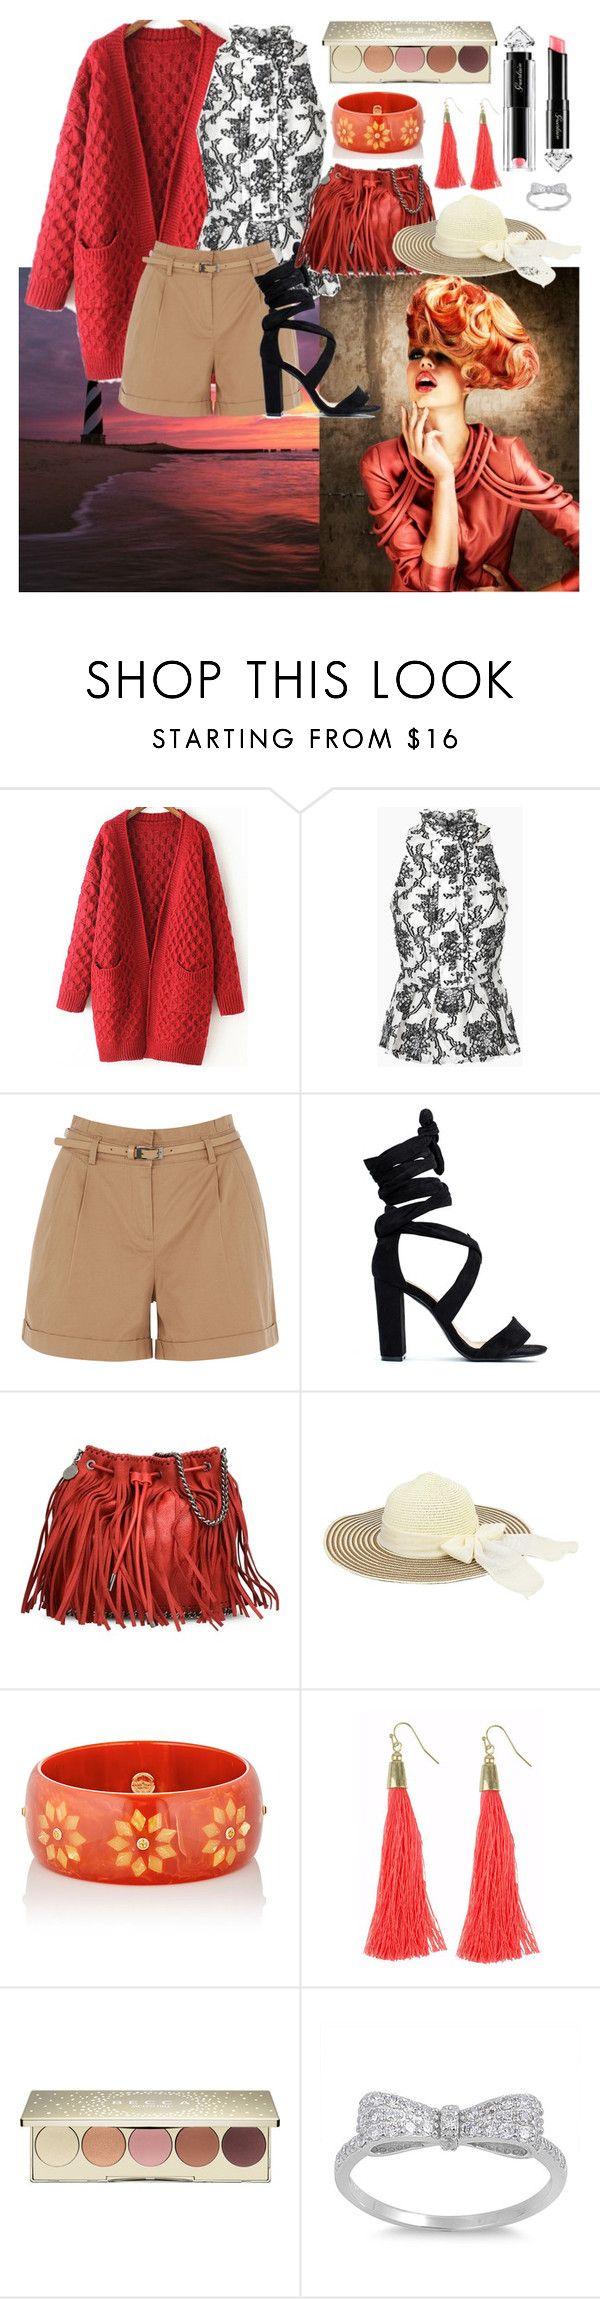 """fashion look n233."" by alemcboss ❤ liked on Polyvore featuring Oasis, STELLA McCARTNEY, Mark Davis, La Petite Robe di Chiara Boni and Becca"